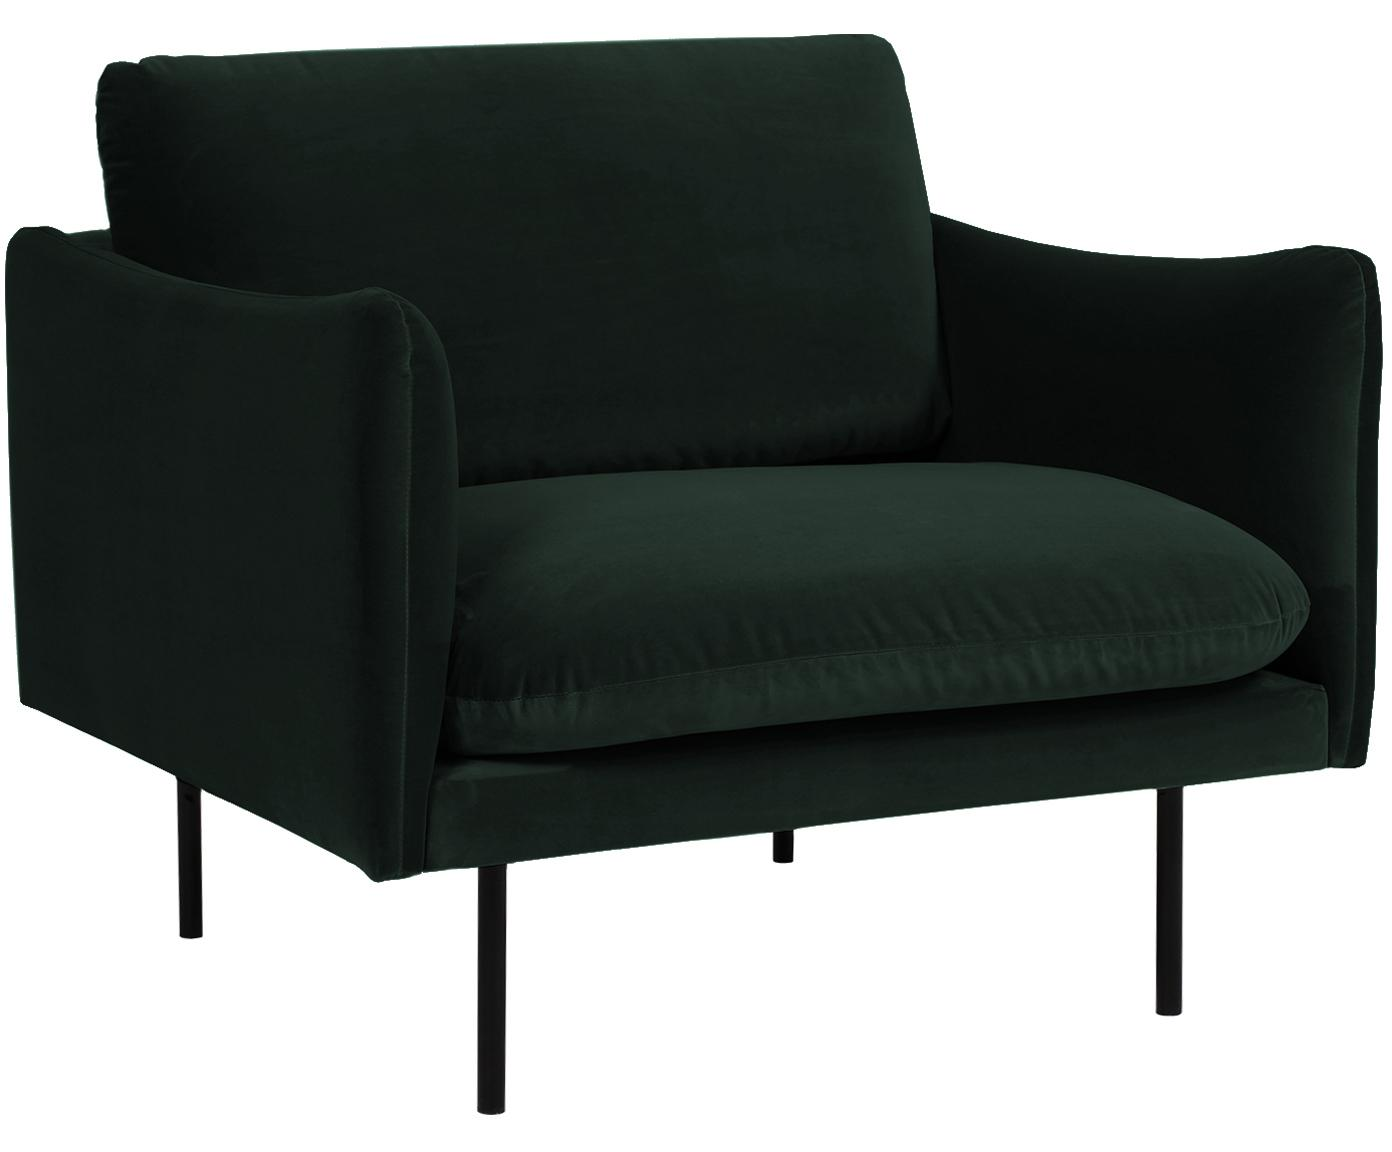 Samt-Sessel Moby, Bezug: Samt (Hochwertiger Polyes, Gestell: Massives Kiefernholz, Samt Dunkelgrün, B 90 x T 90 cm